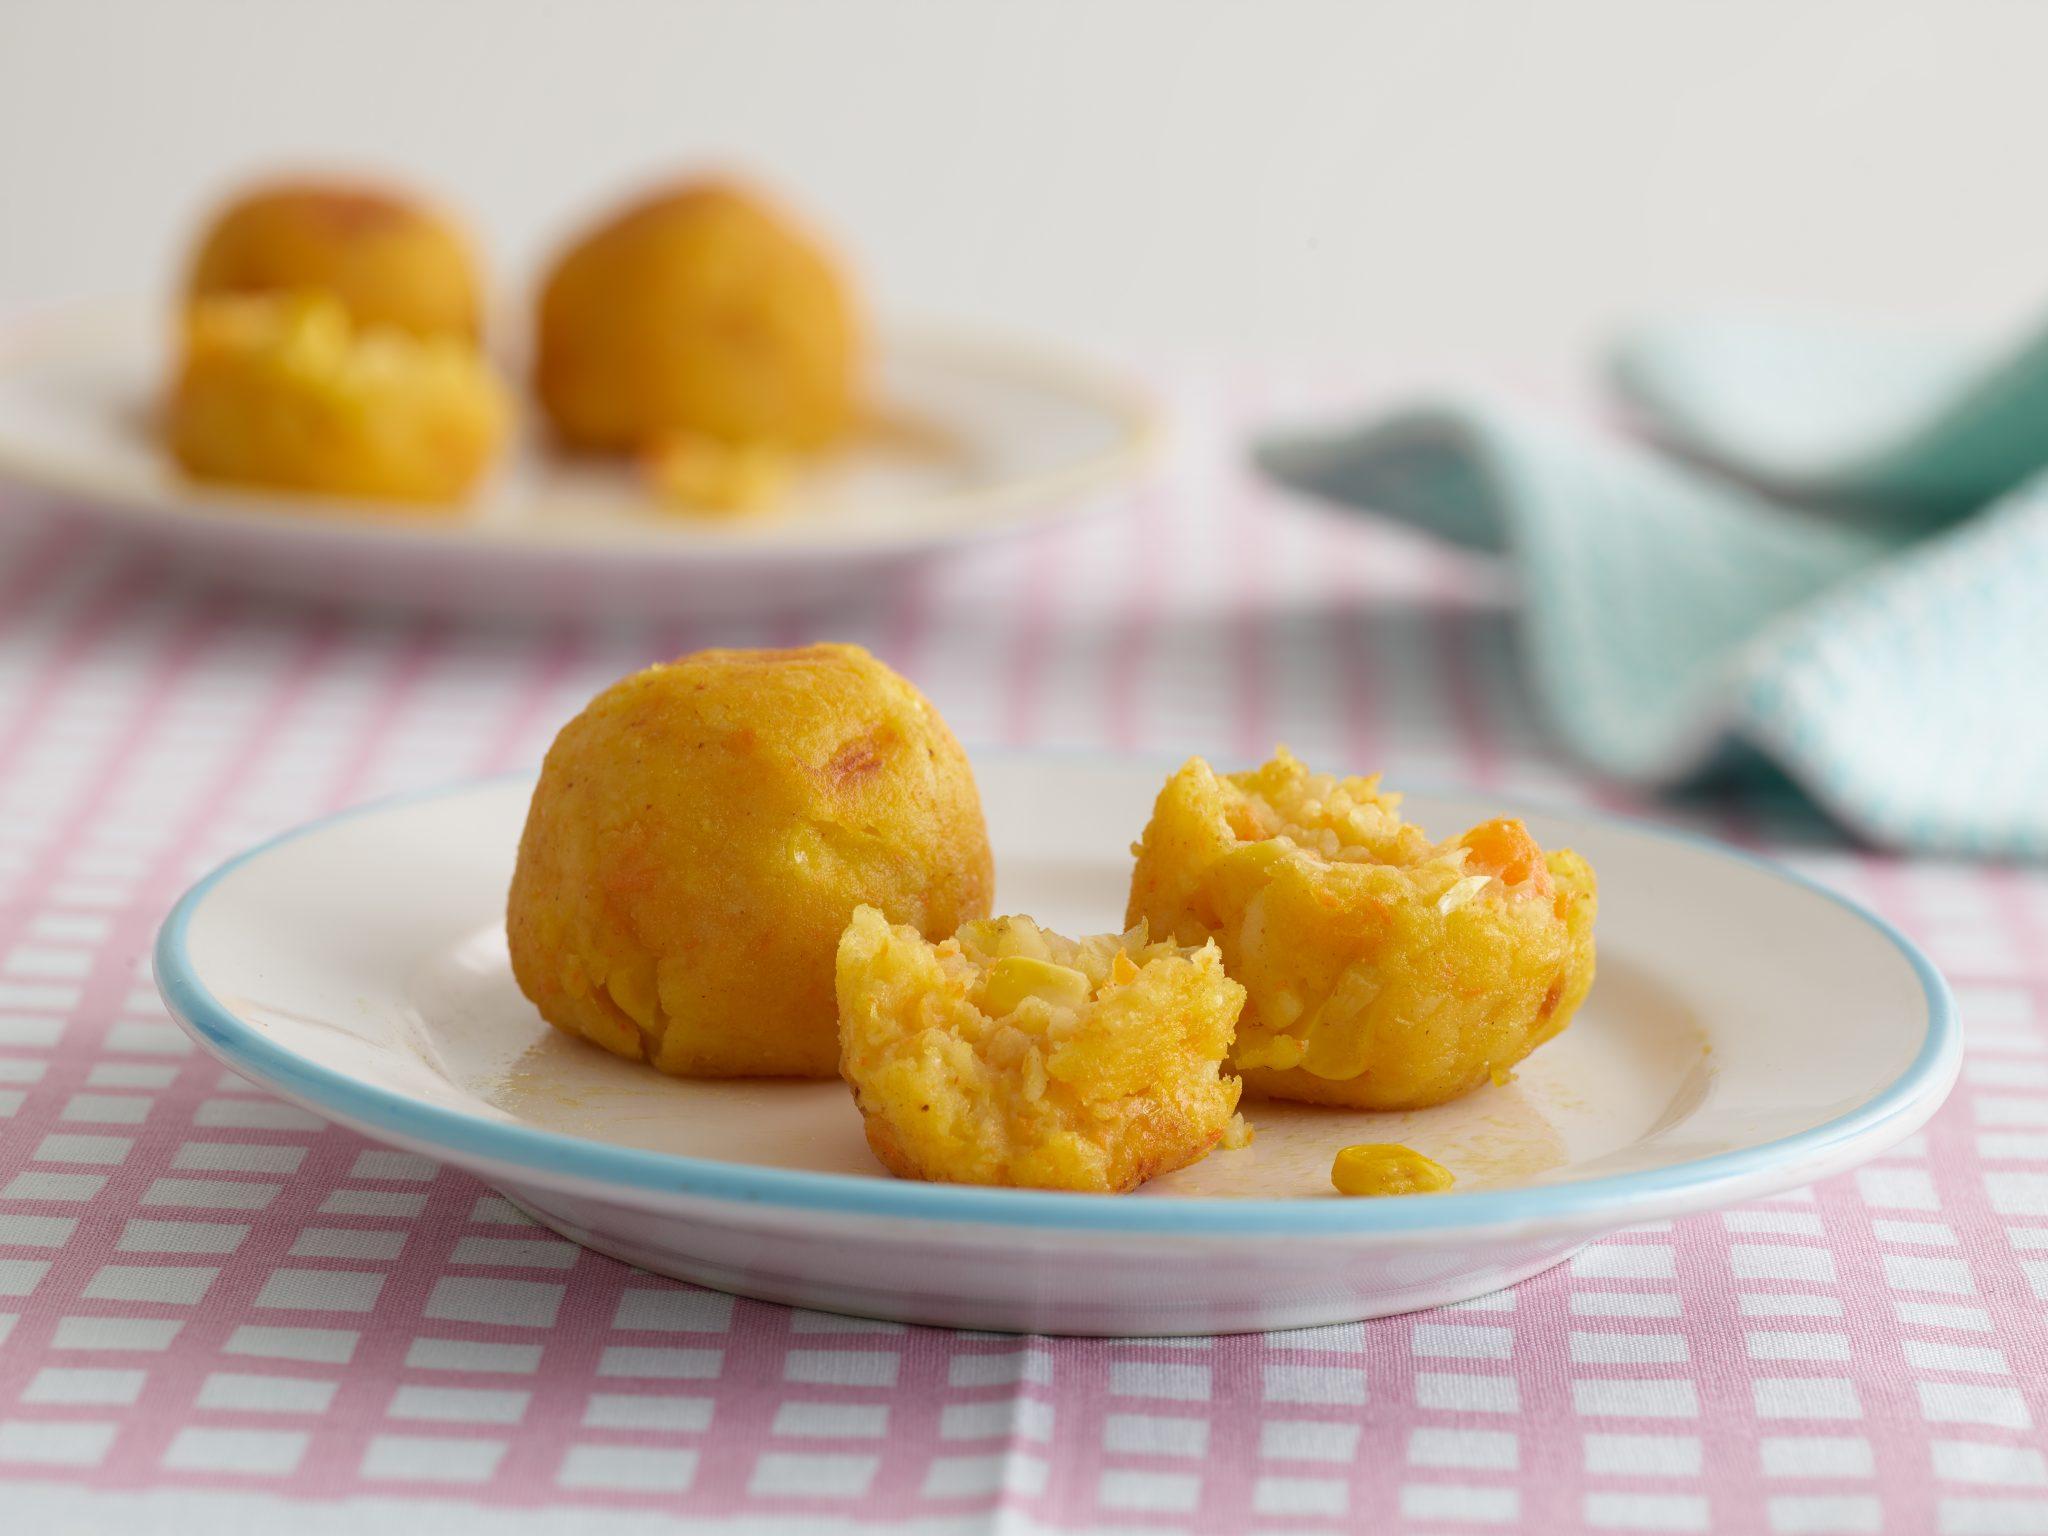 potato, carrot and sweetcorn balls recipe by annabel karmel